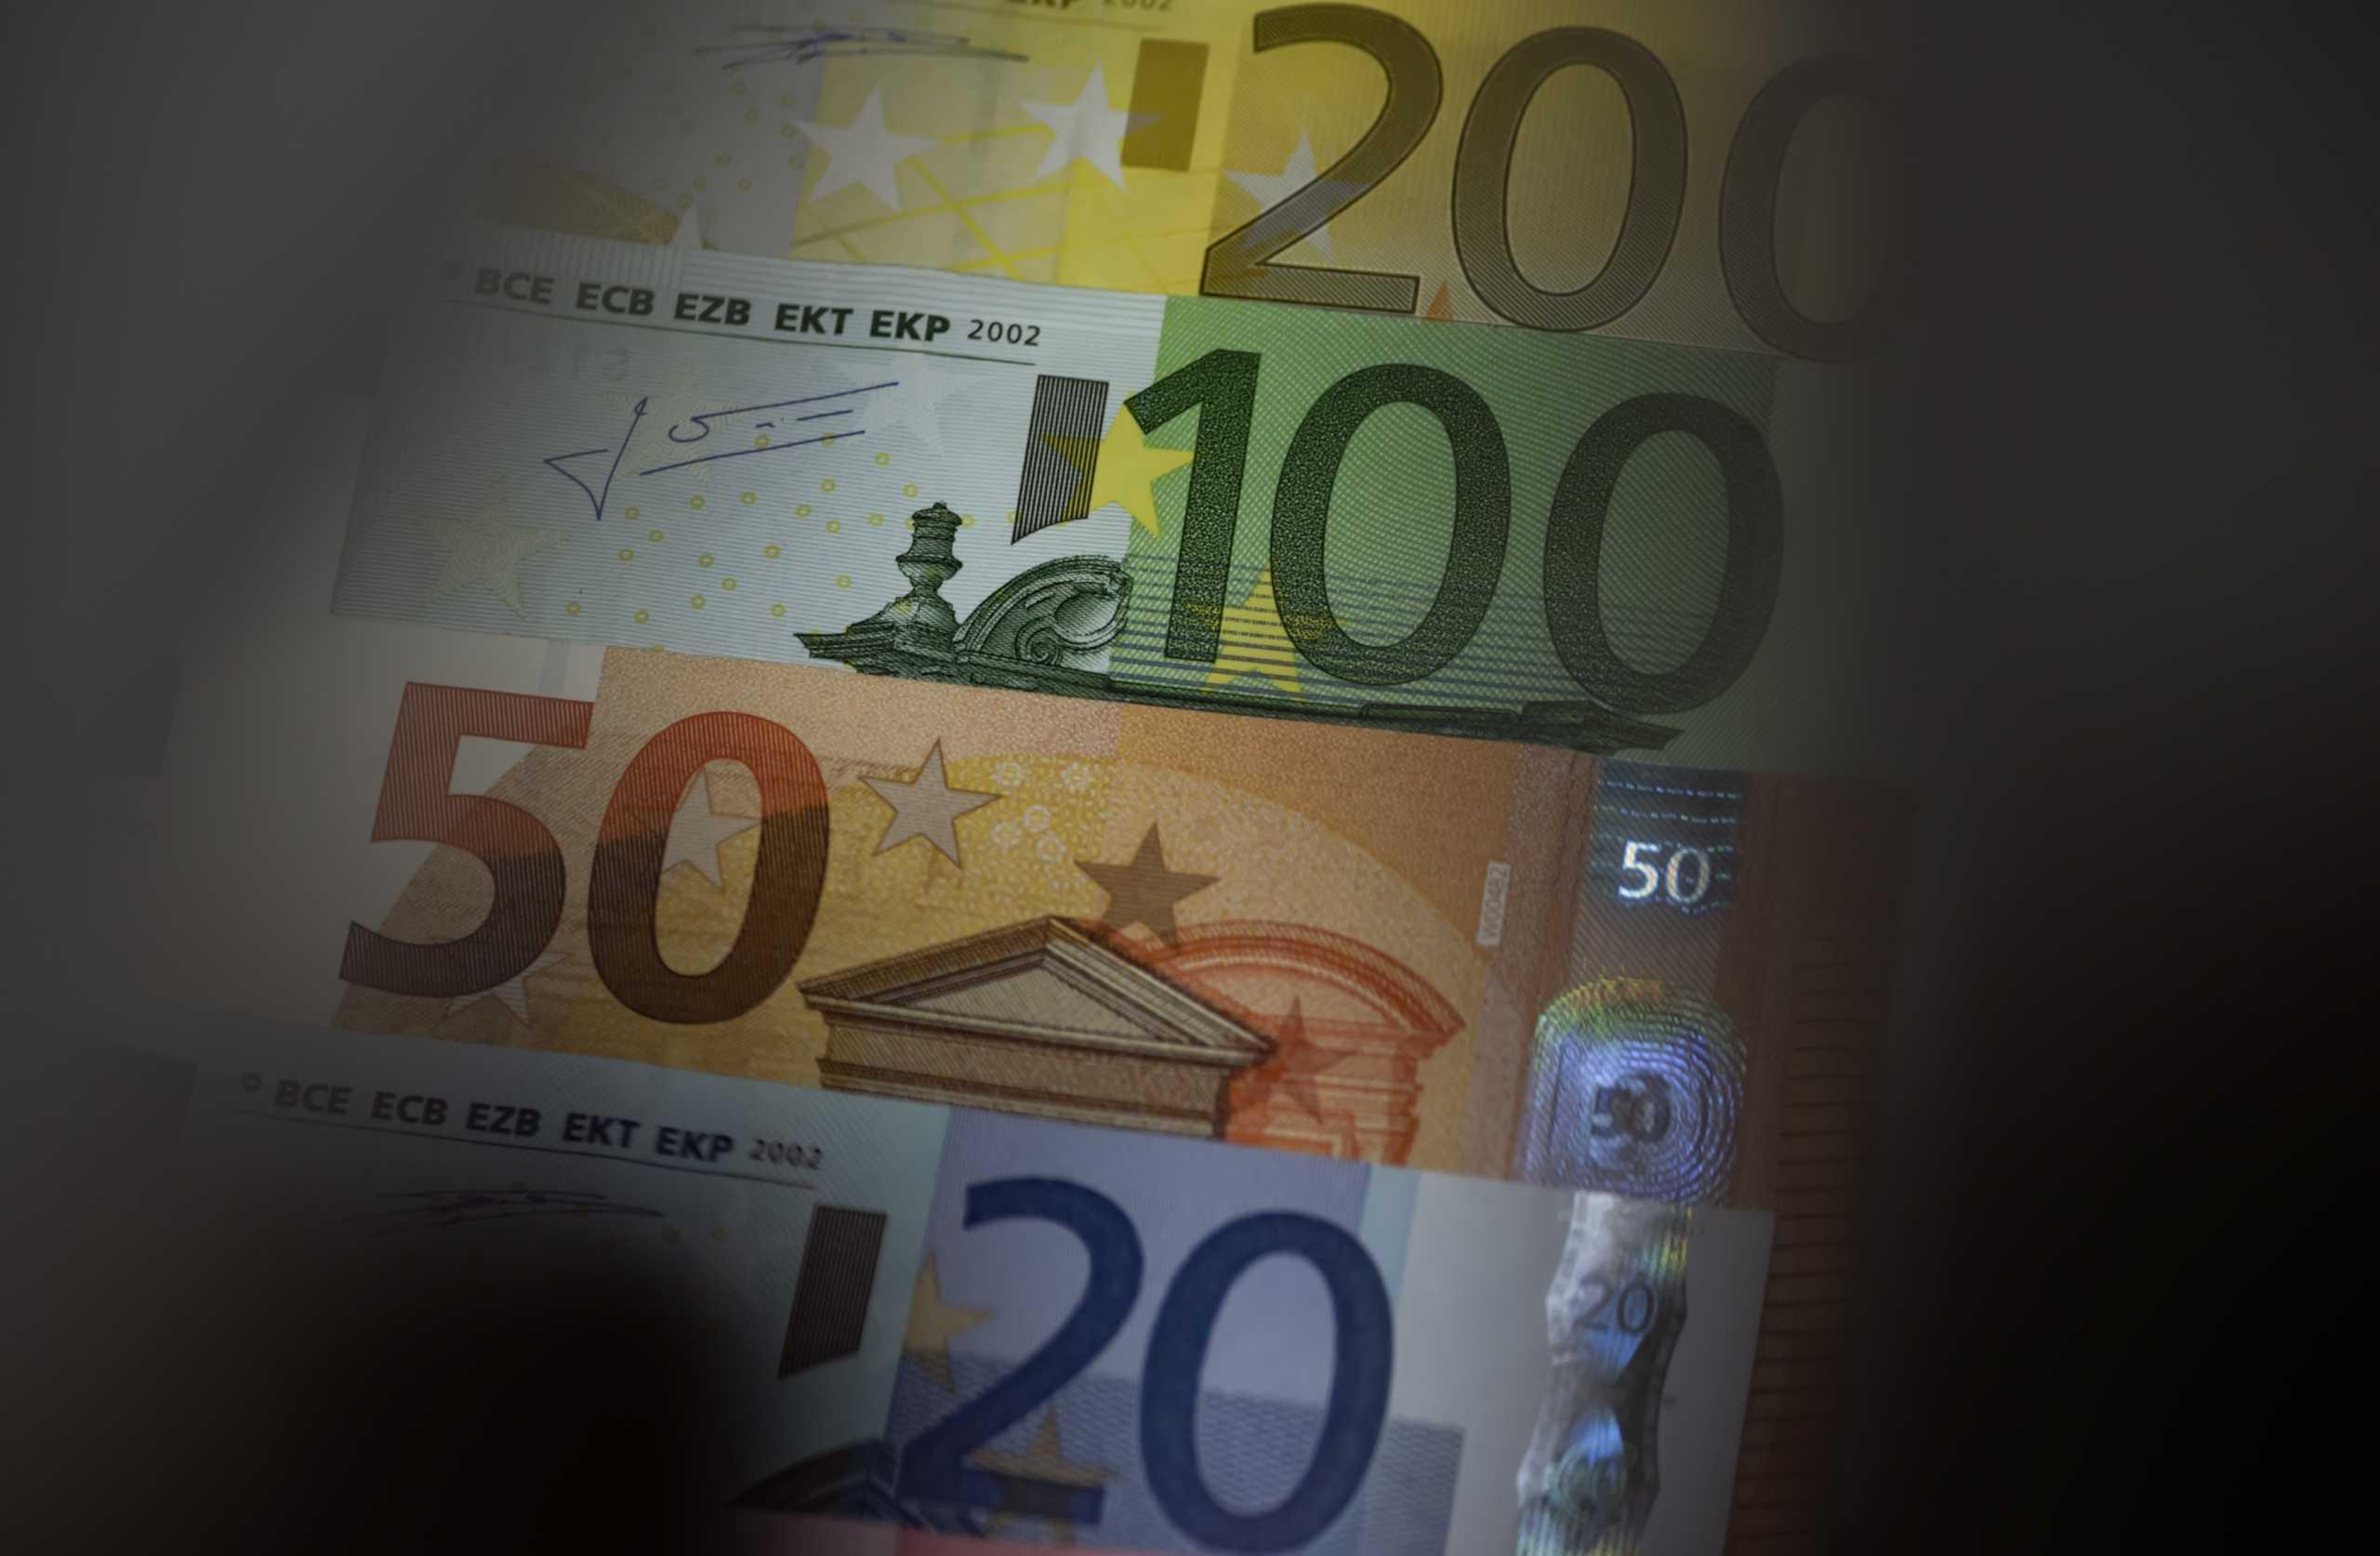 S&P:Η Ελλάδα μπορεί να απορροφήσει τις συνέπειες από μία ενδεχόμενη αύξηση των επιτοκίων παγκοσμίως